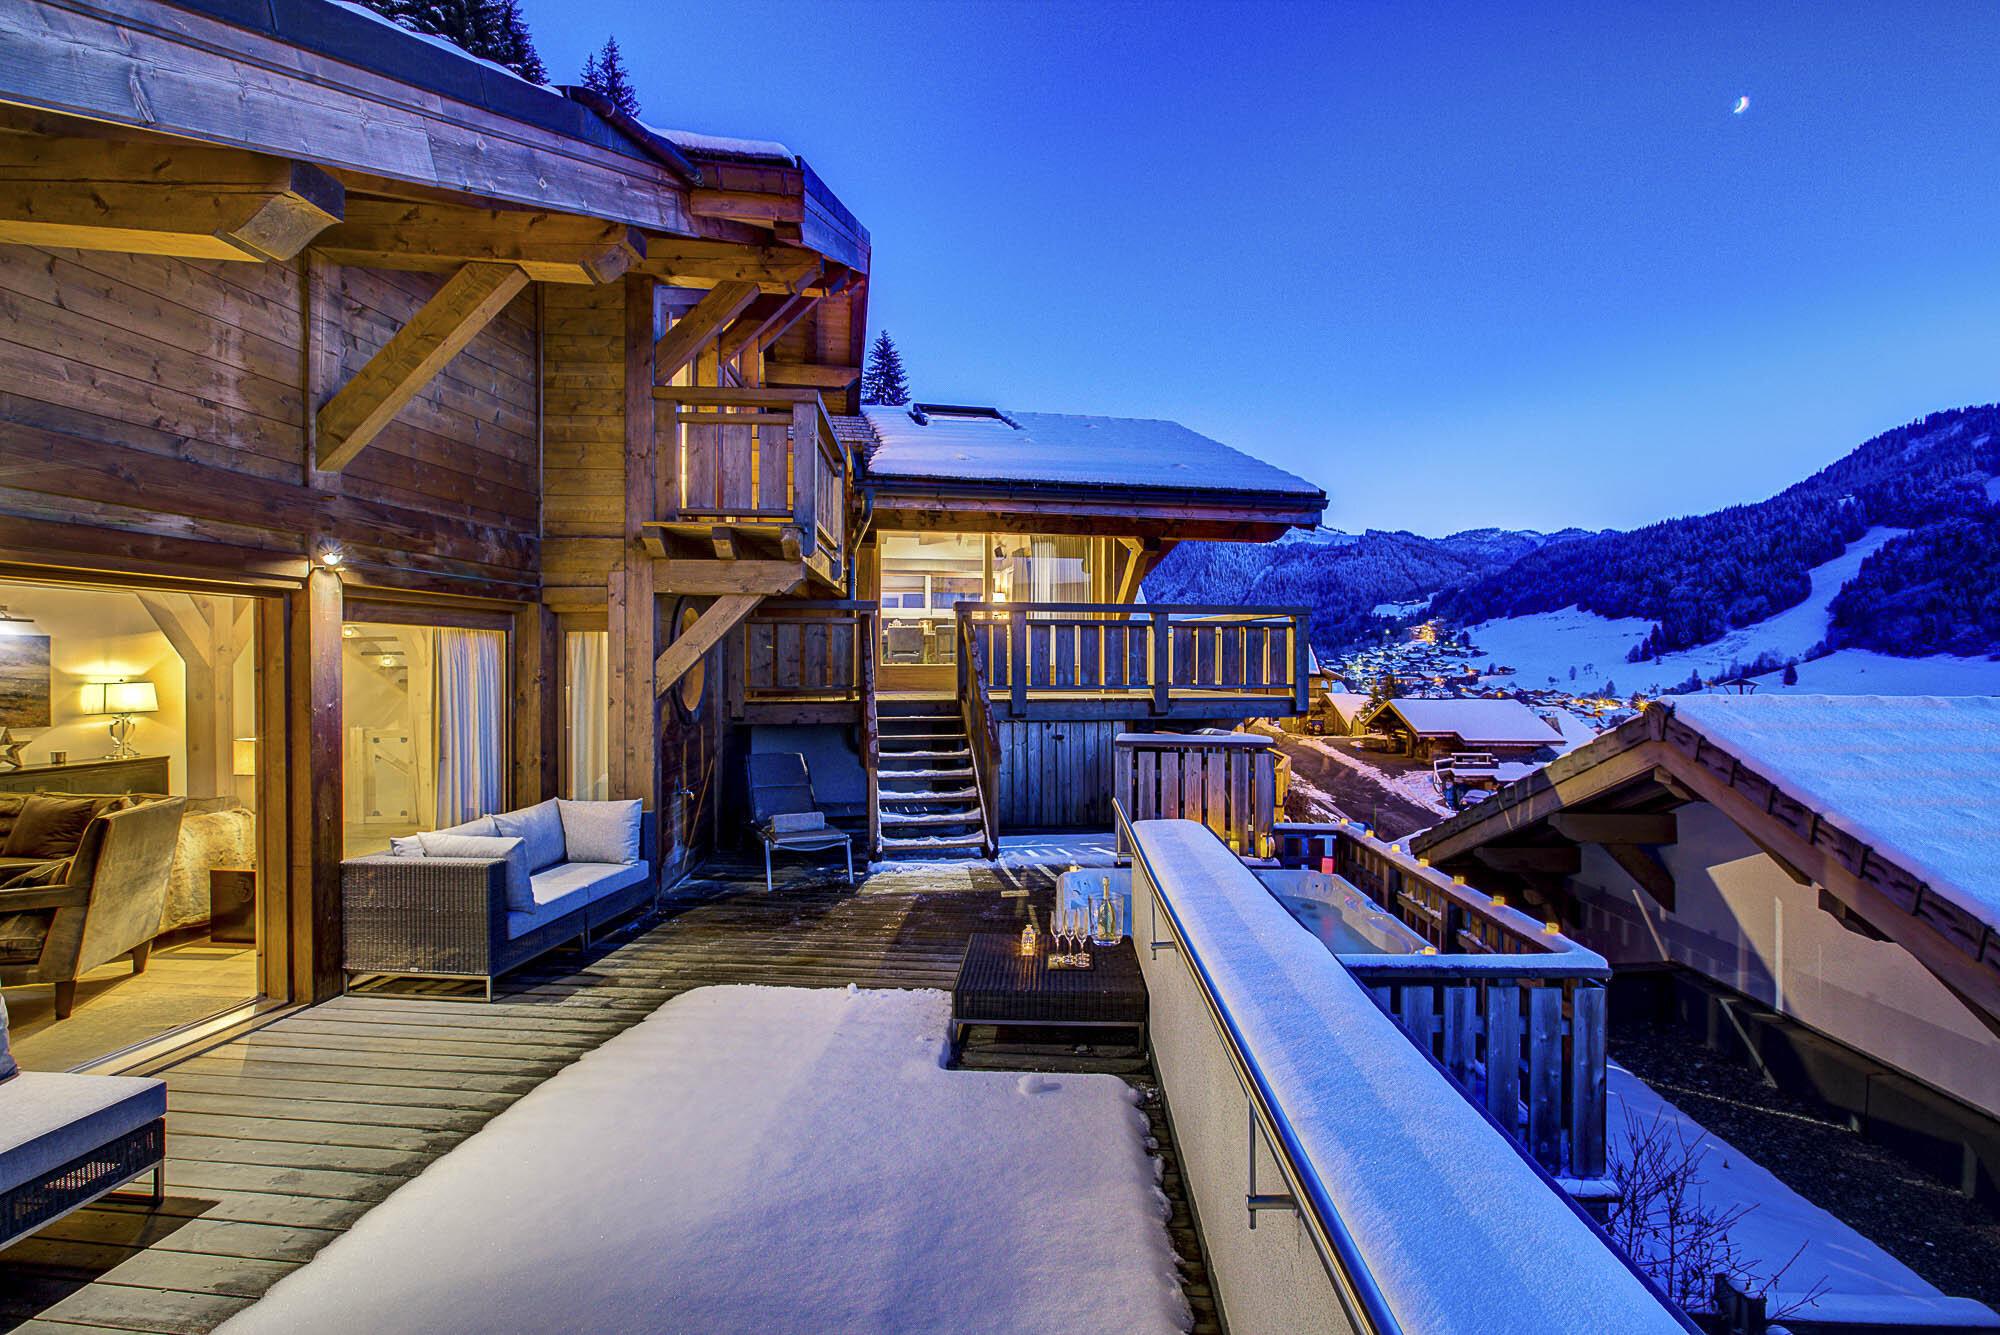 tg-ski-luxury-chalet-bouquetin-morzine-019.jpg